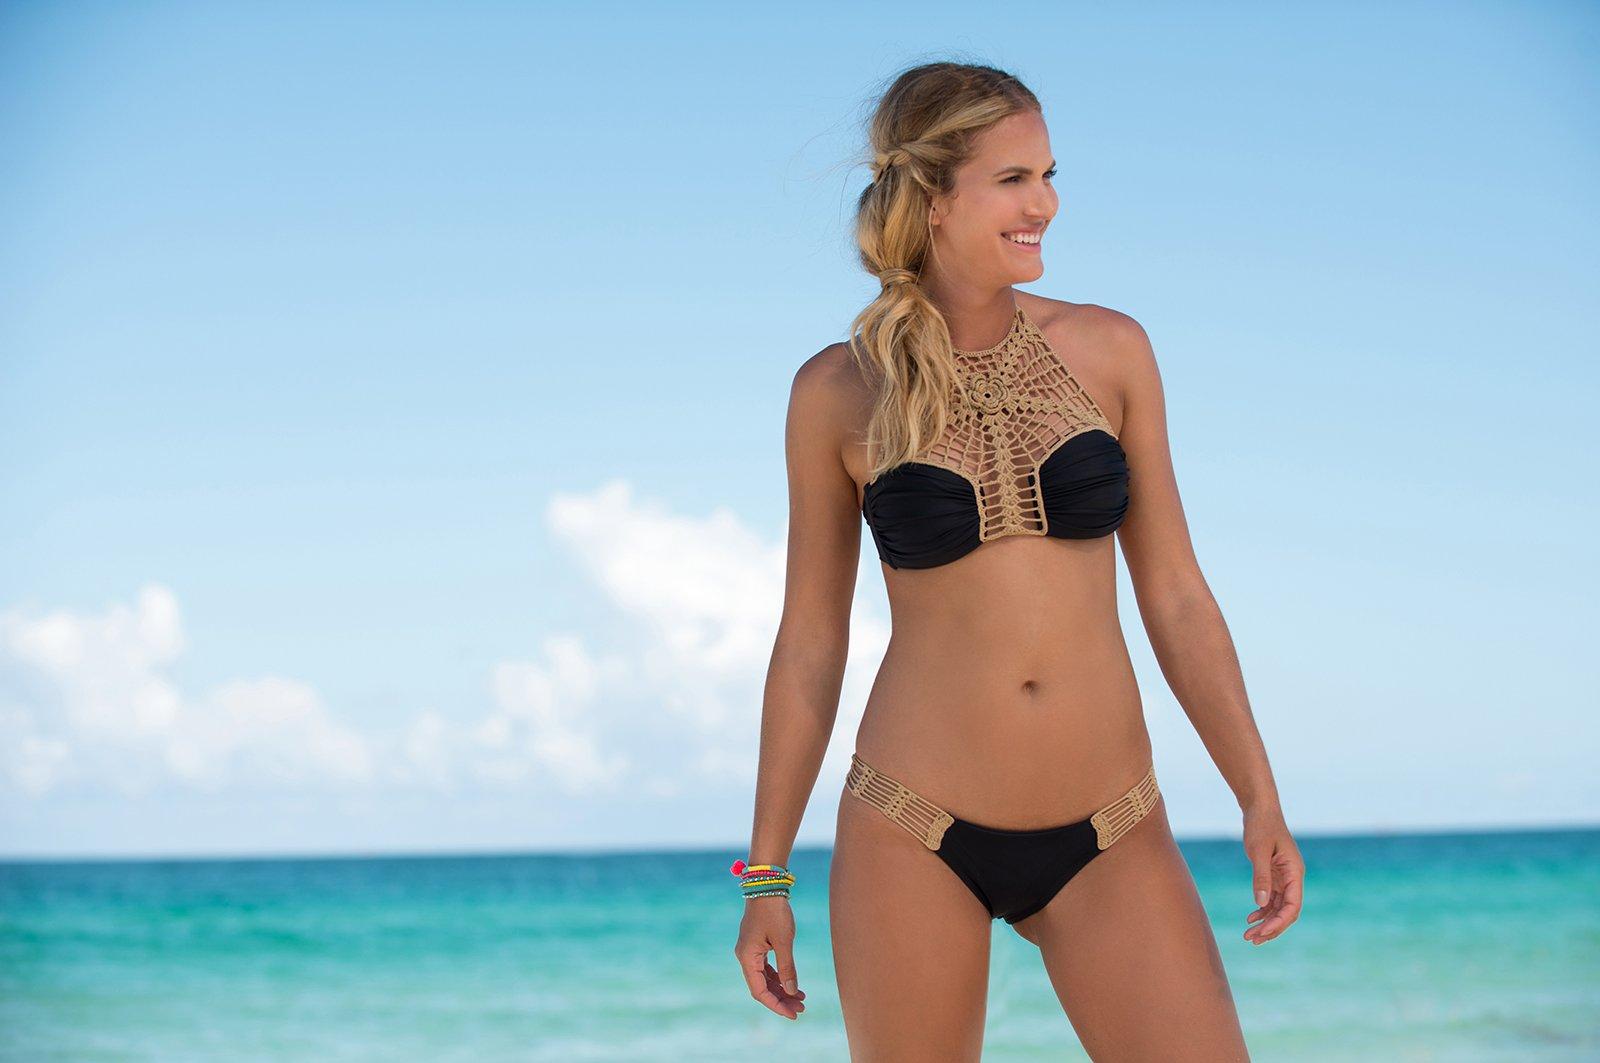 ccbdcabc01f3 Bikinier Sort Crop Top Bikini Med Hæklede Detaljer - Dhalia